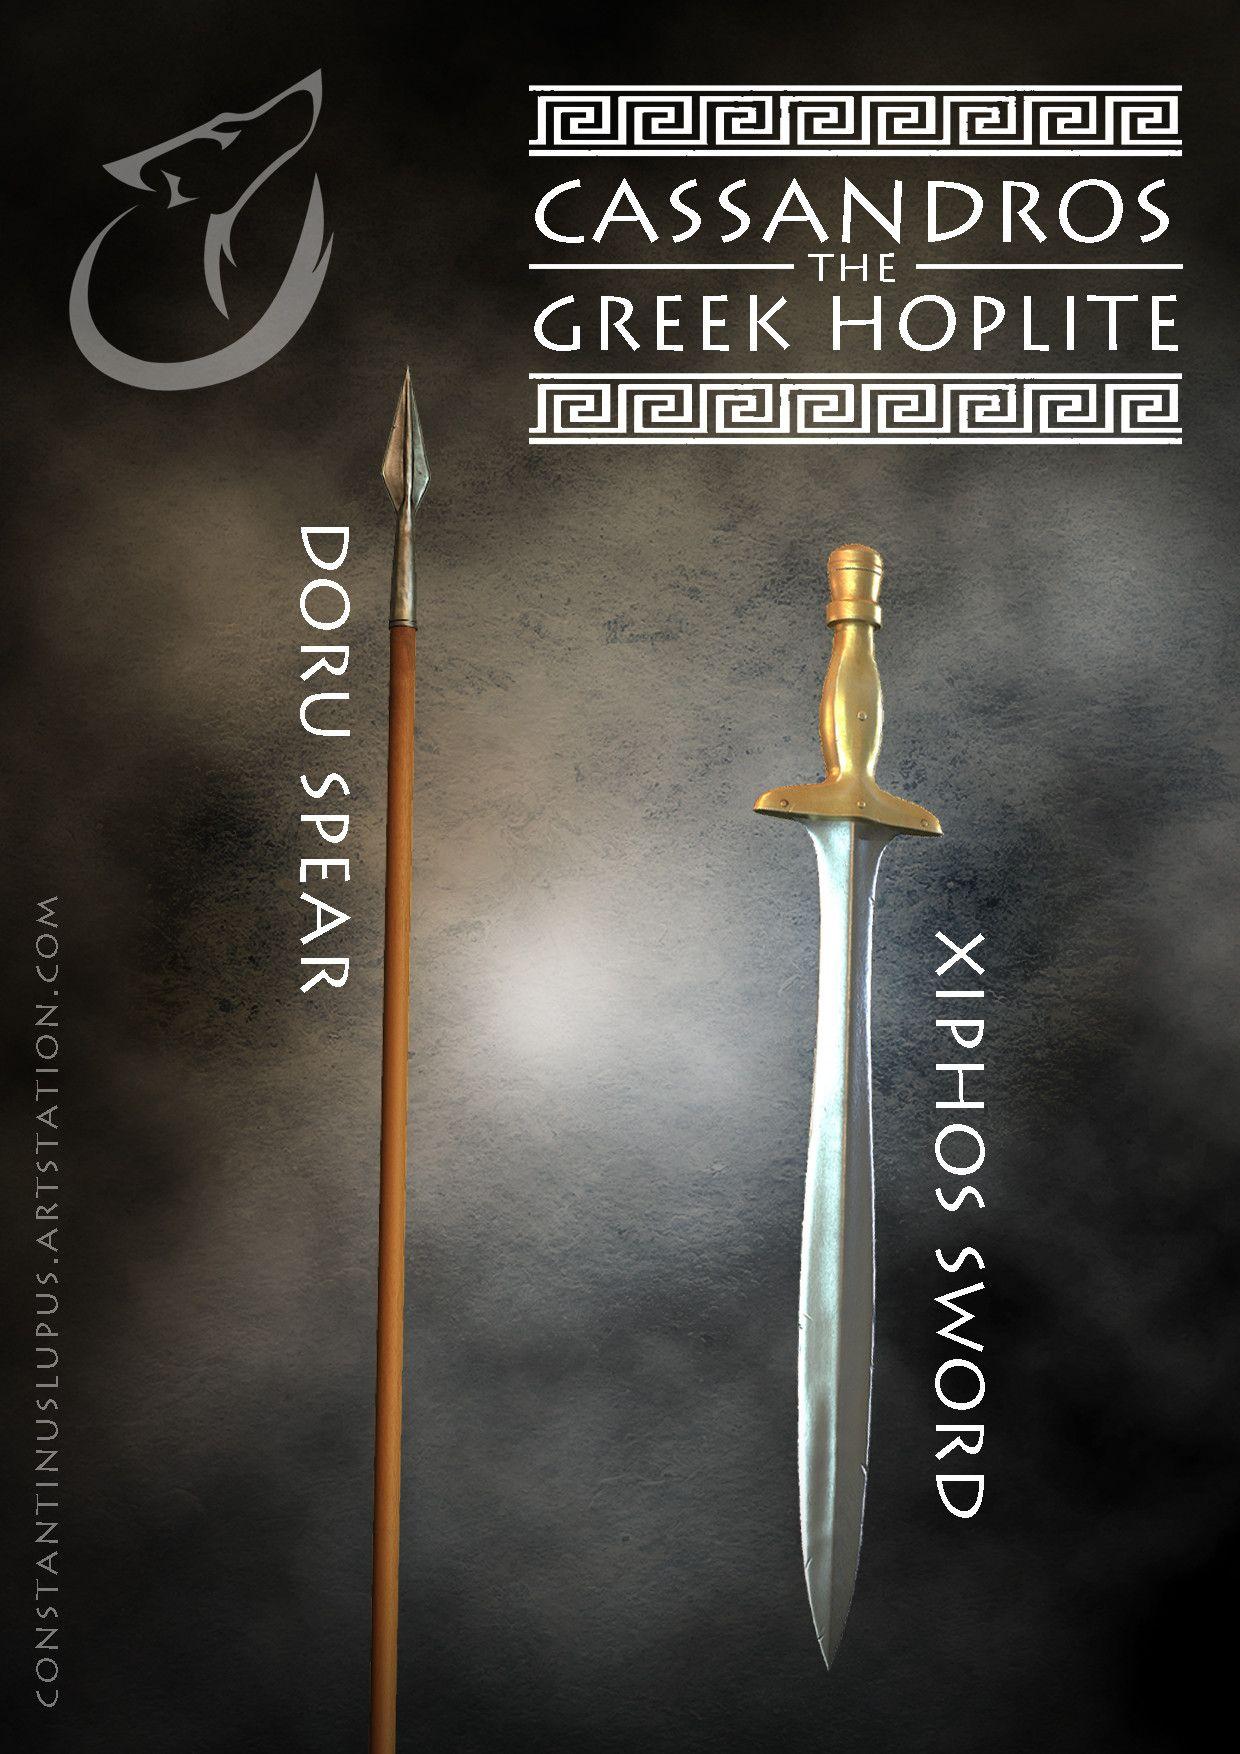 Ancient Greek Doru Spear - Year of Clean Water